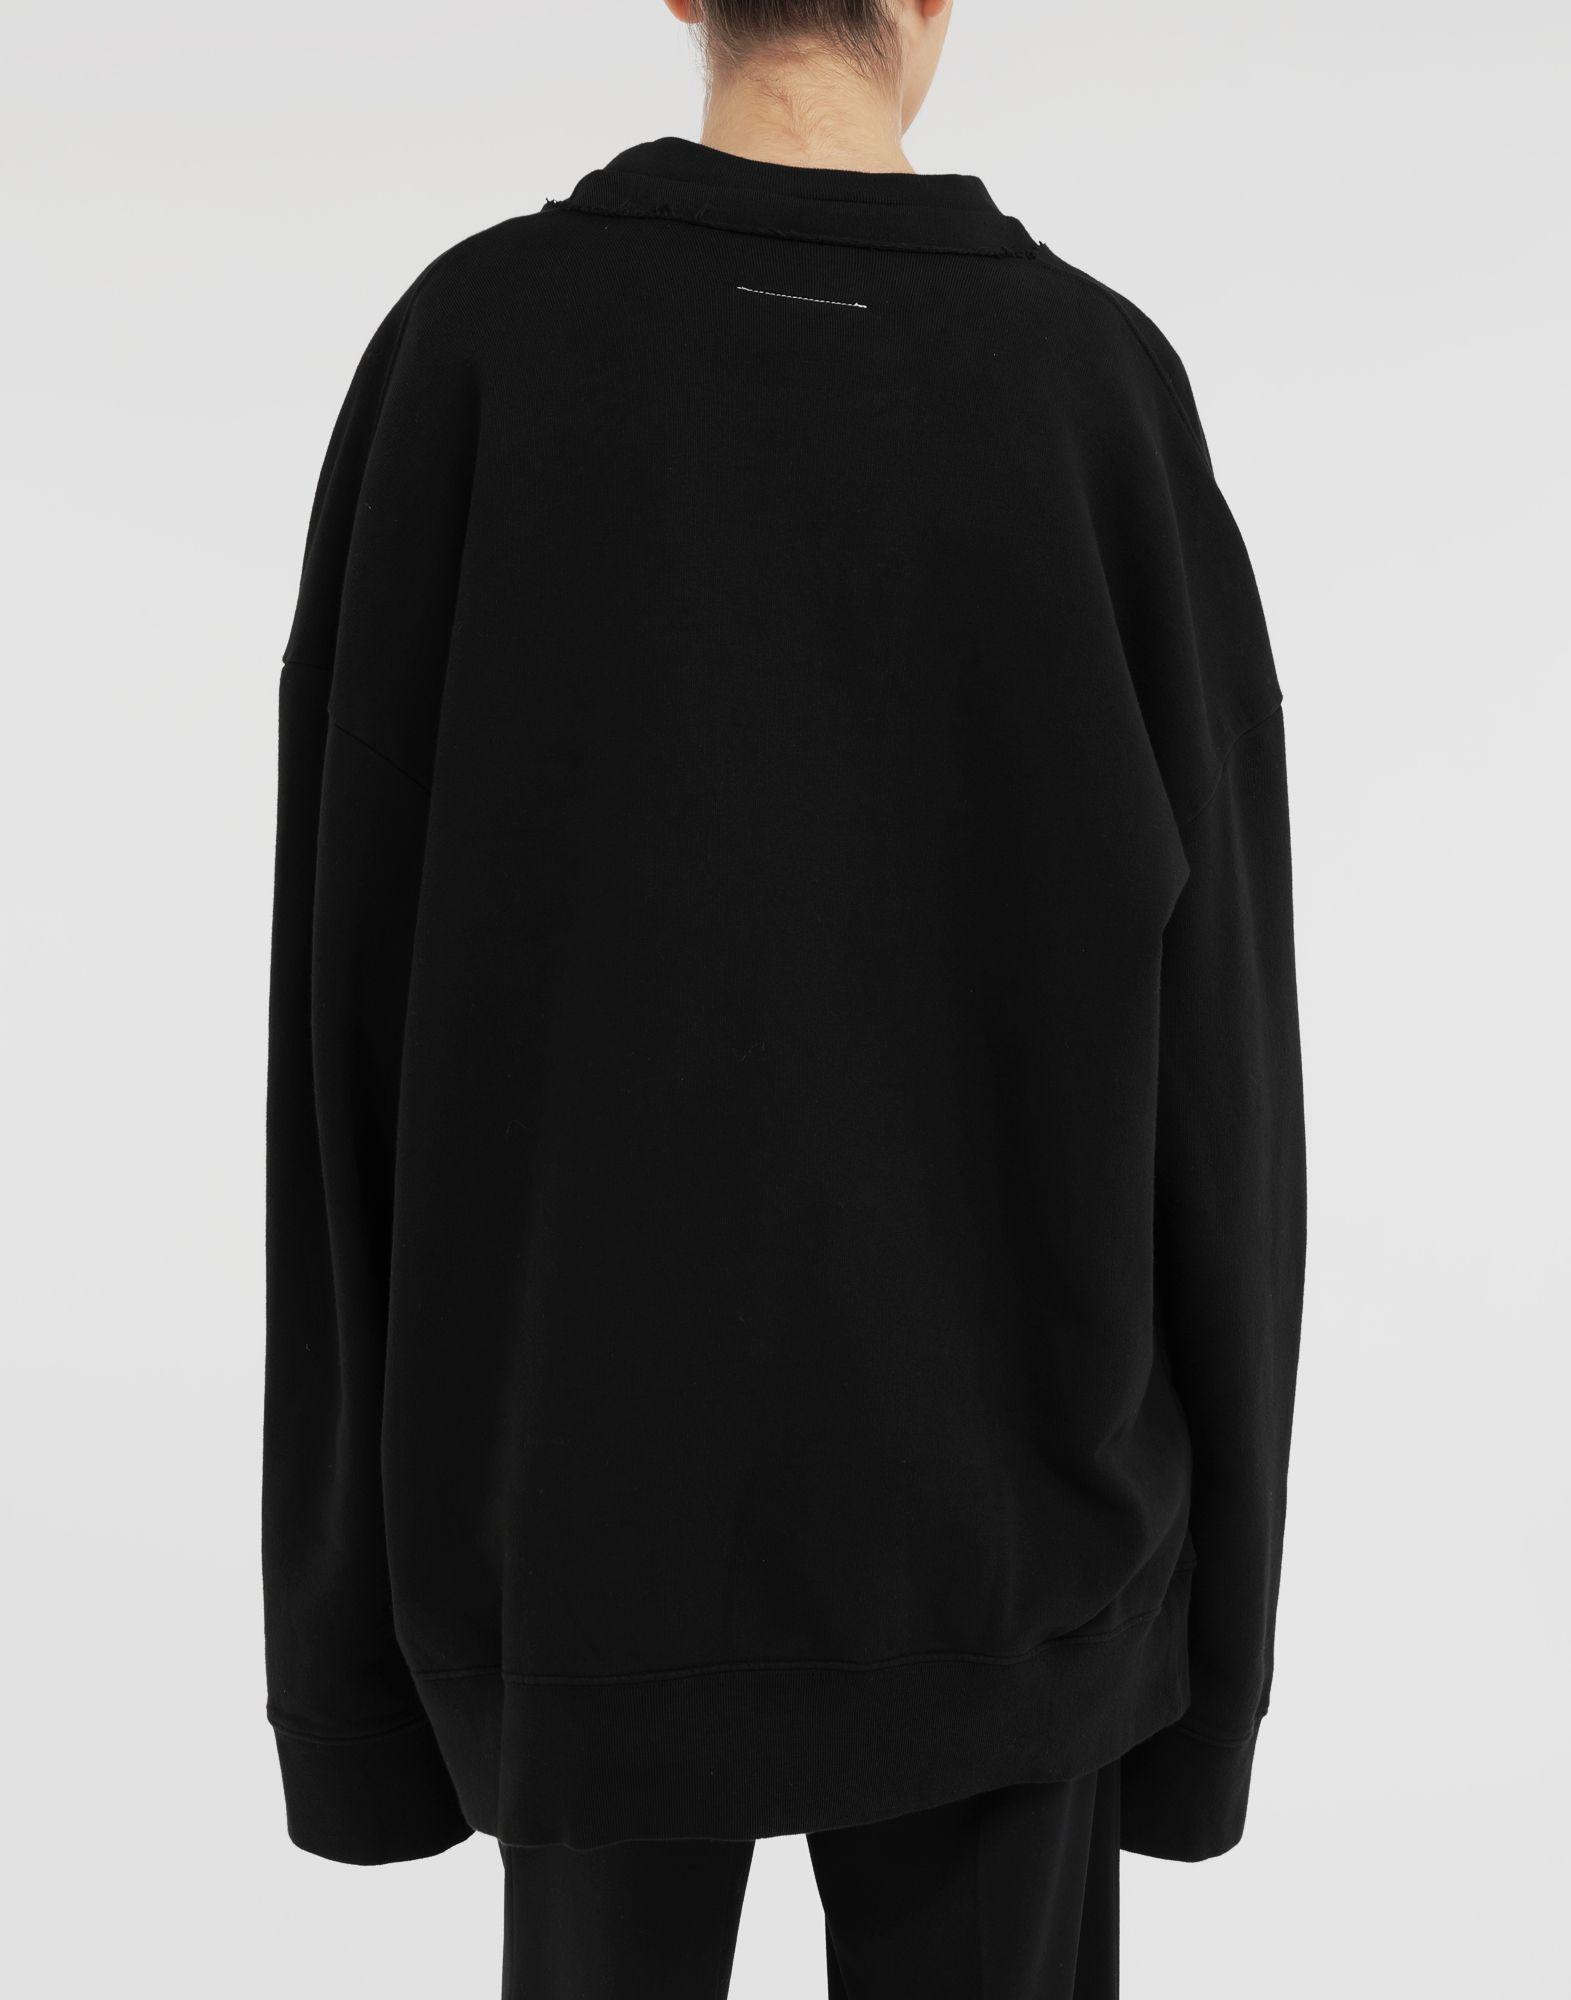 MM6 MAISON MARGIELA AIDS Charity sweatshirt Sweatshirt Woman e